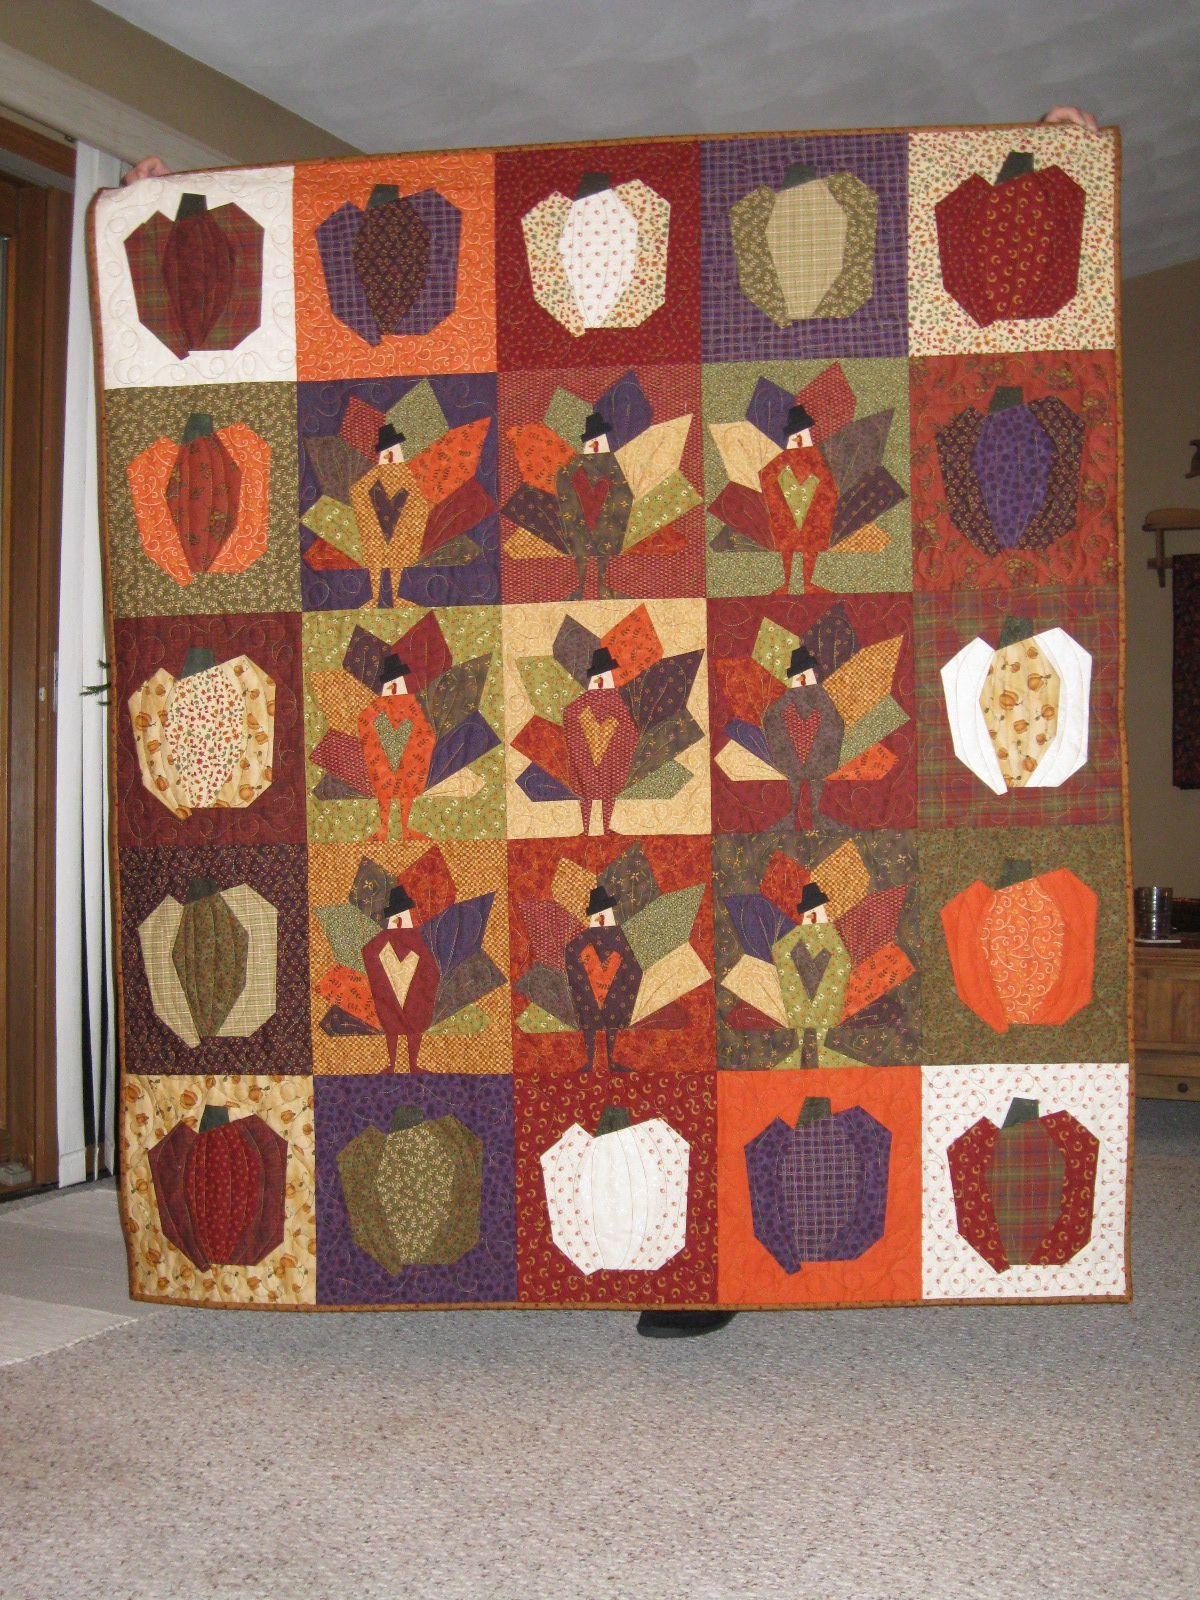 Crazy Tom Turkey pattern by Buggy Barn   My Quilts   Pinterest ... : buggy barn quilt show - Adamdwight.com